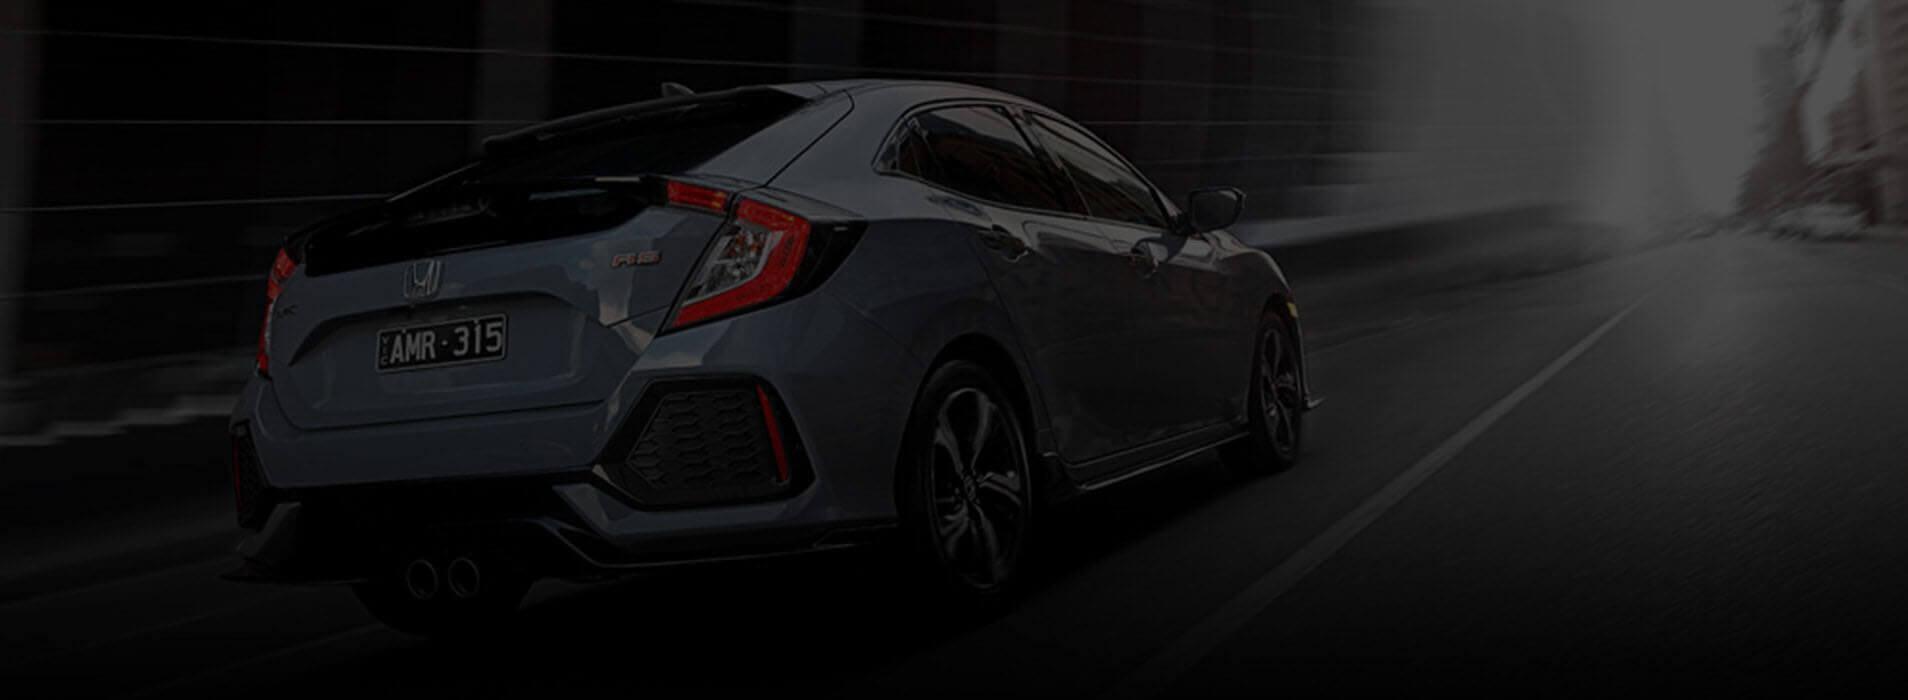 Civic Hatch Design